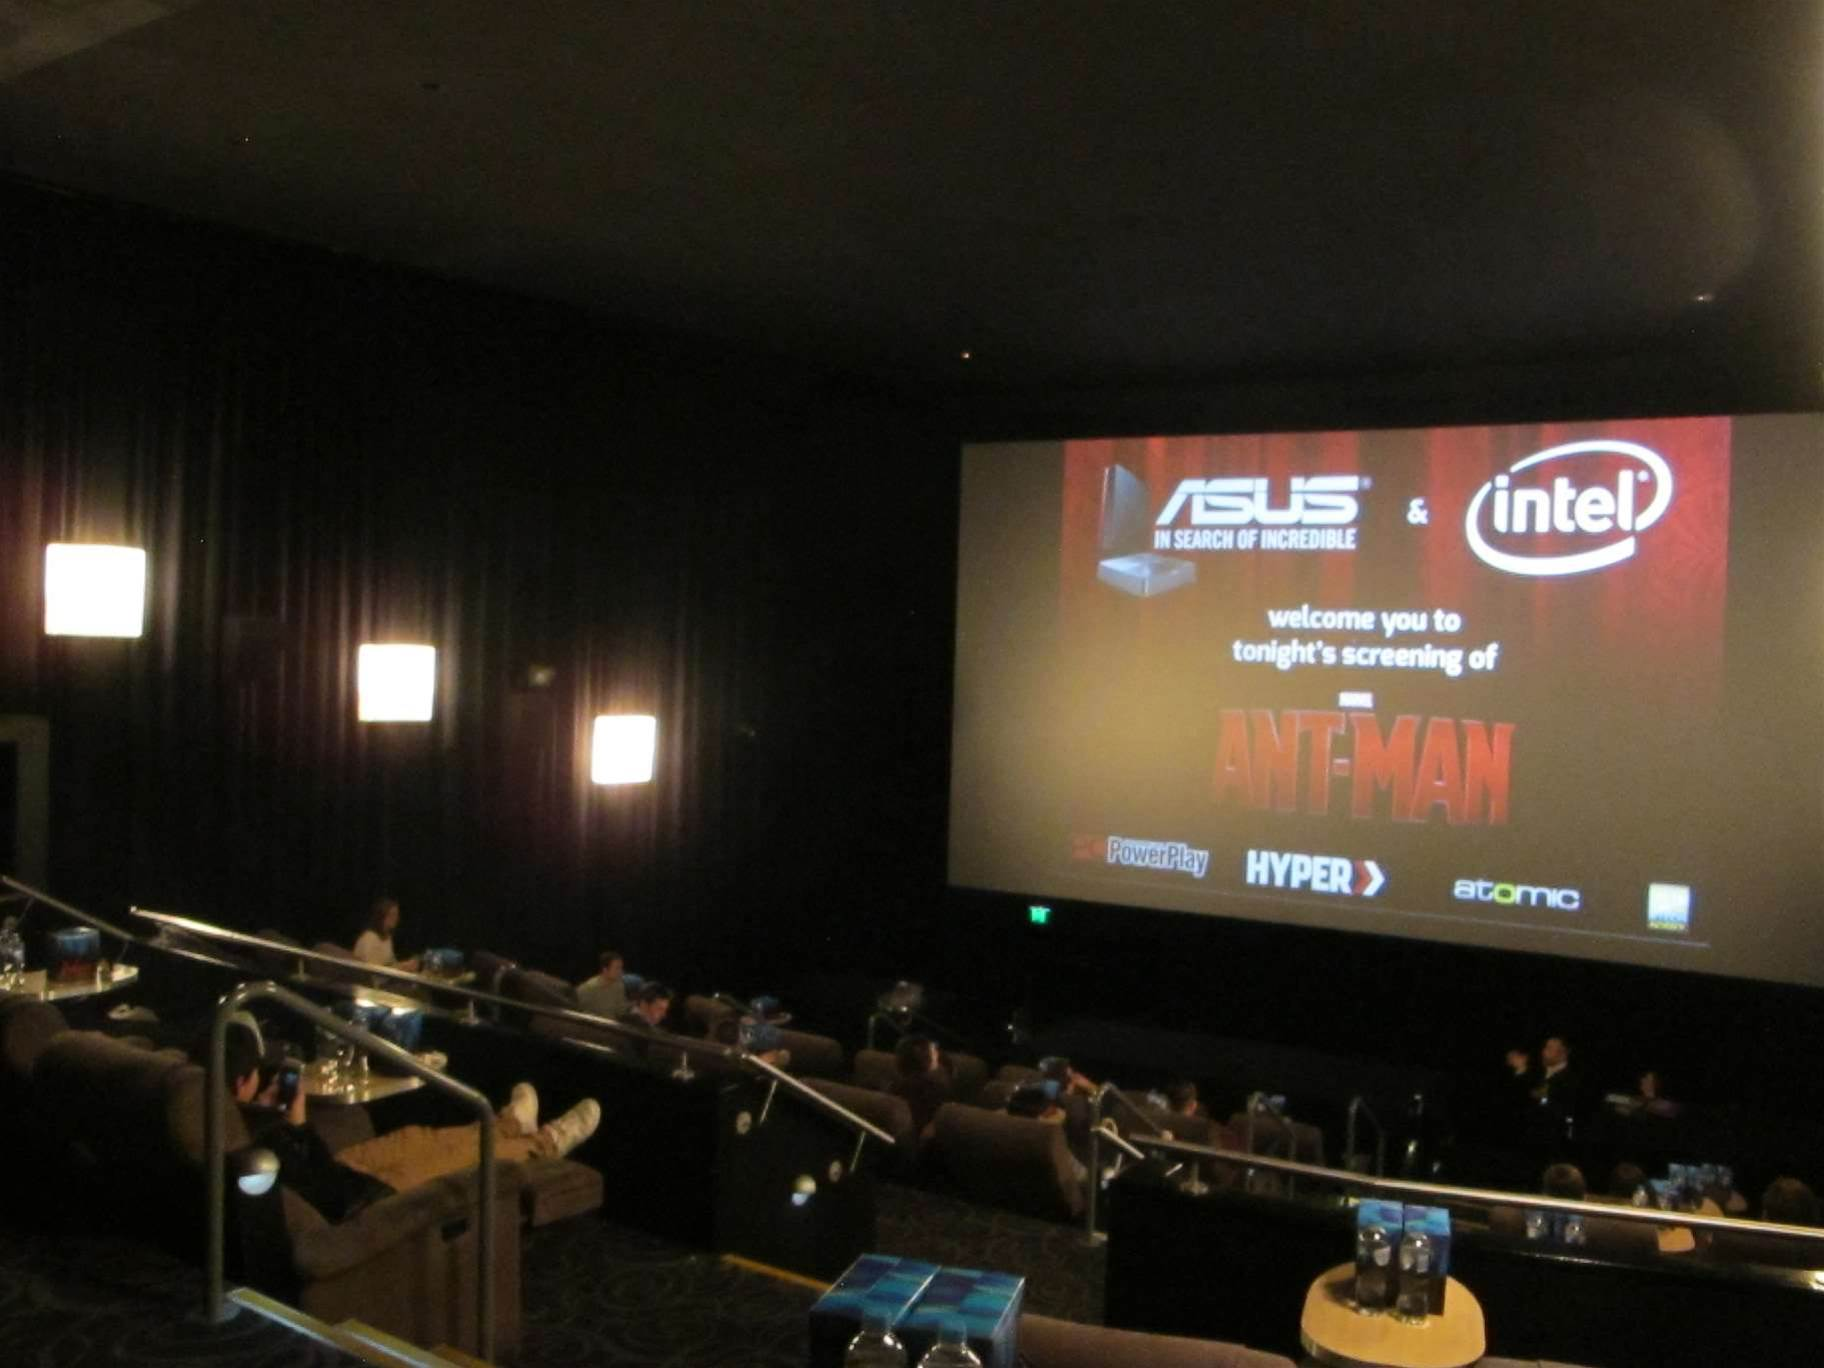 ASUS shows off new gear at Ant Man screening